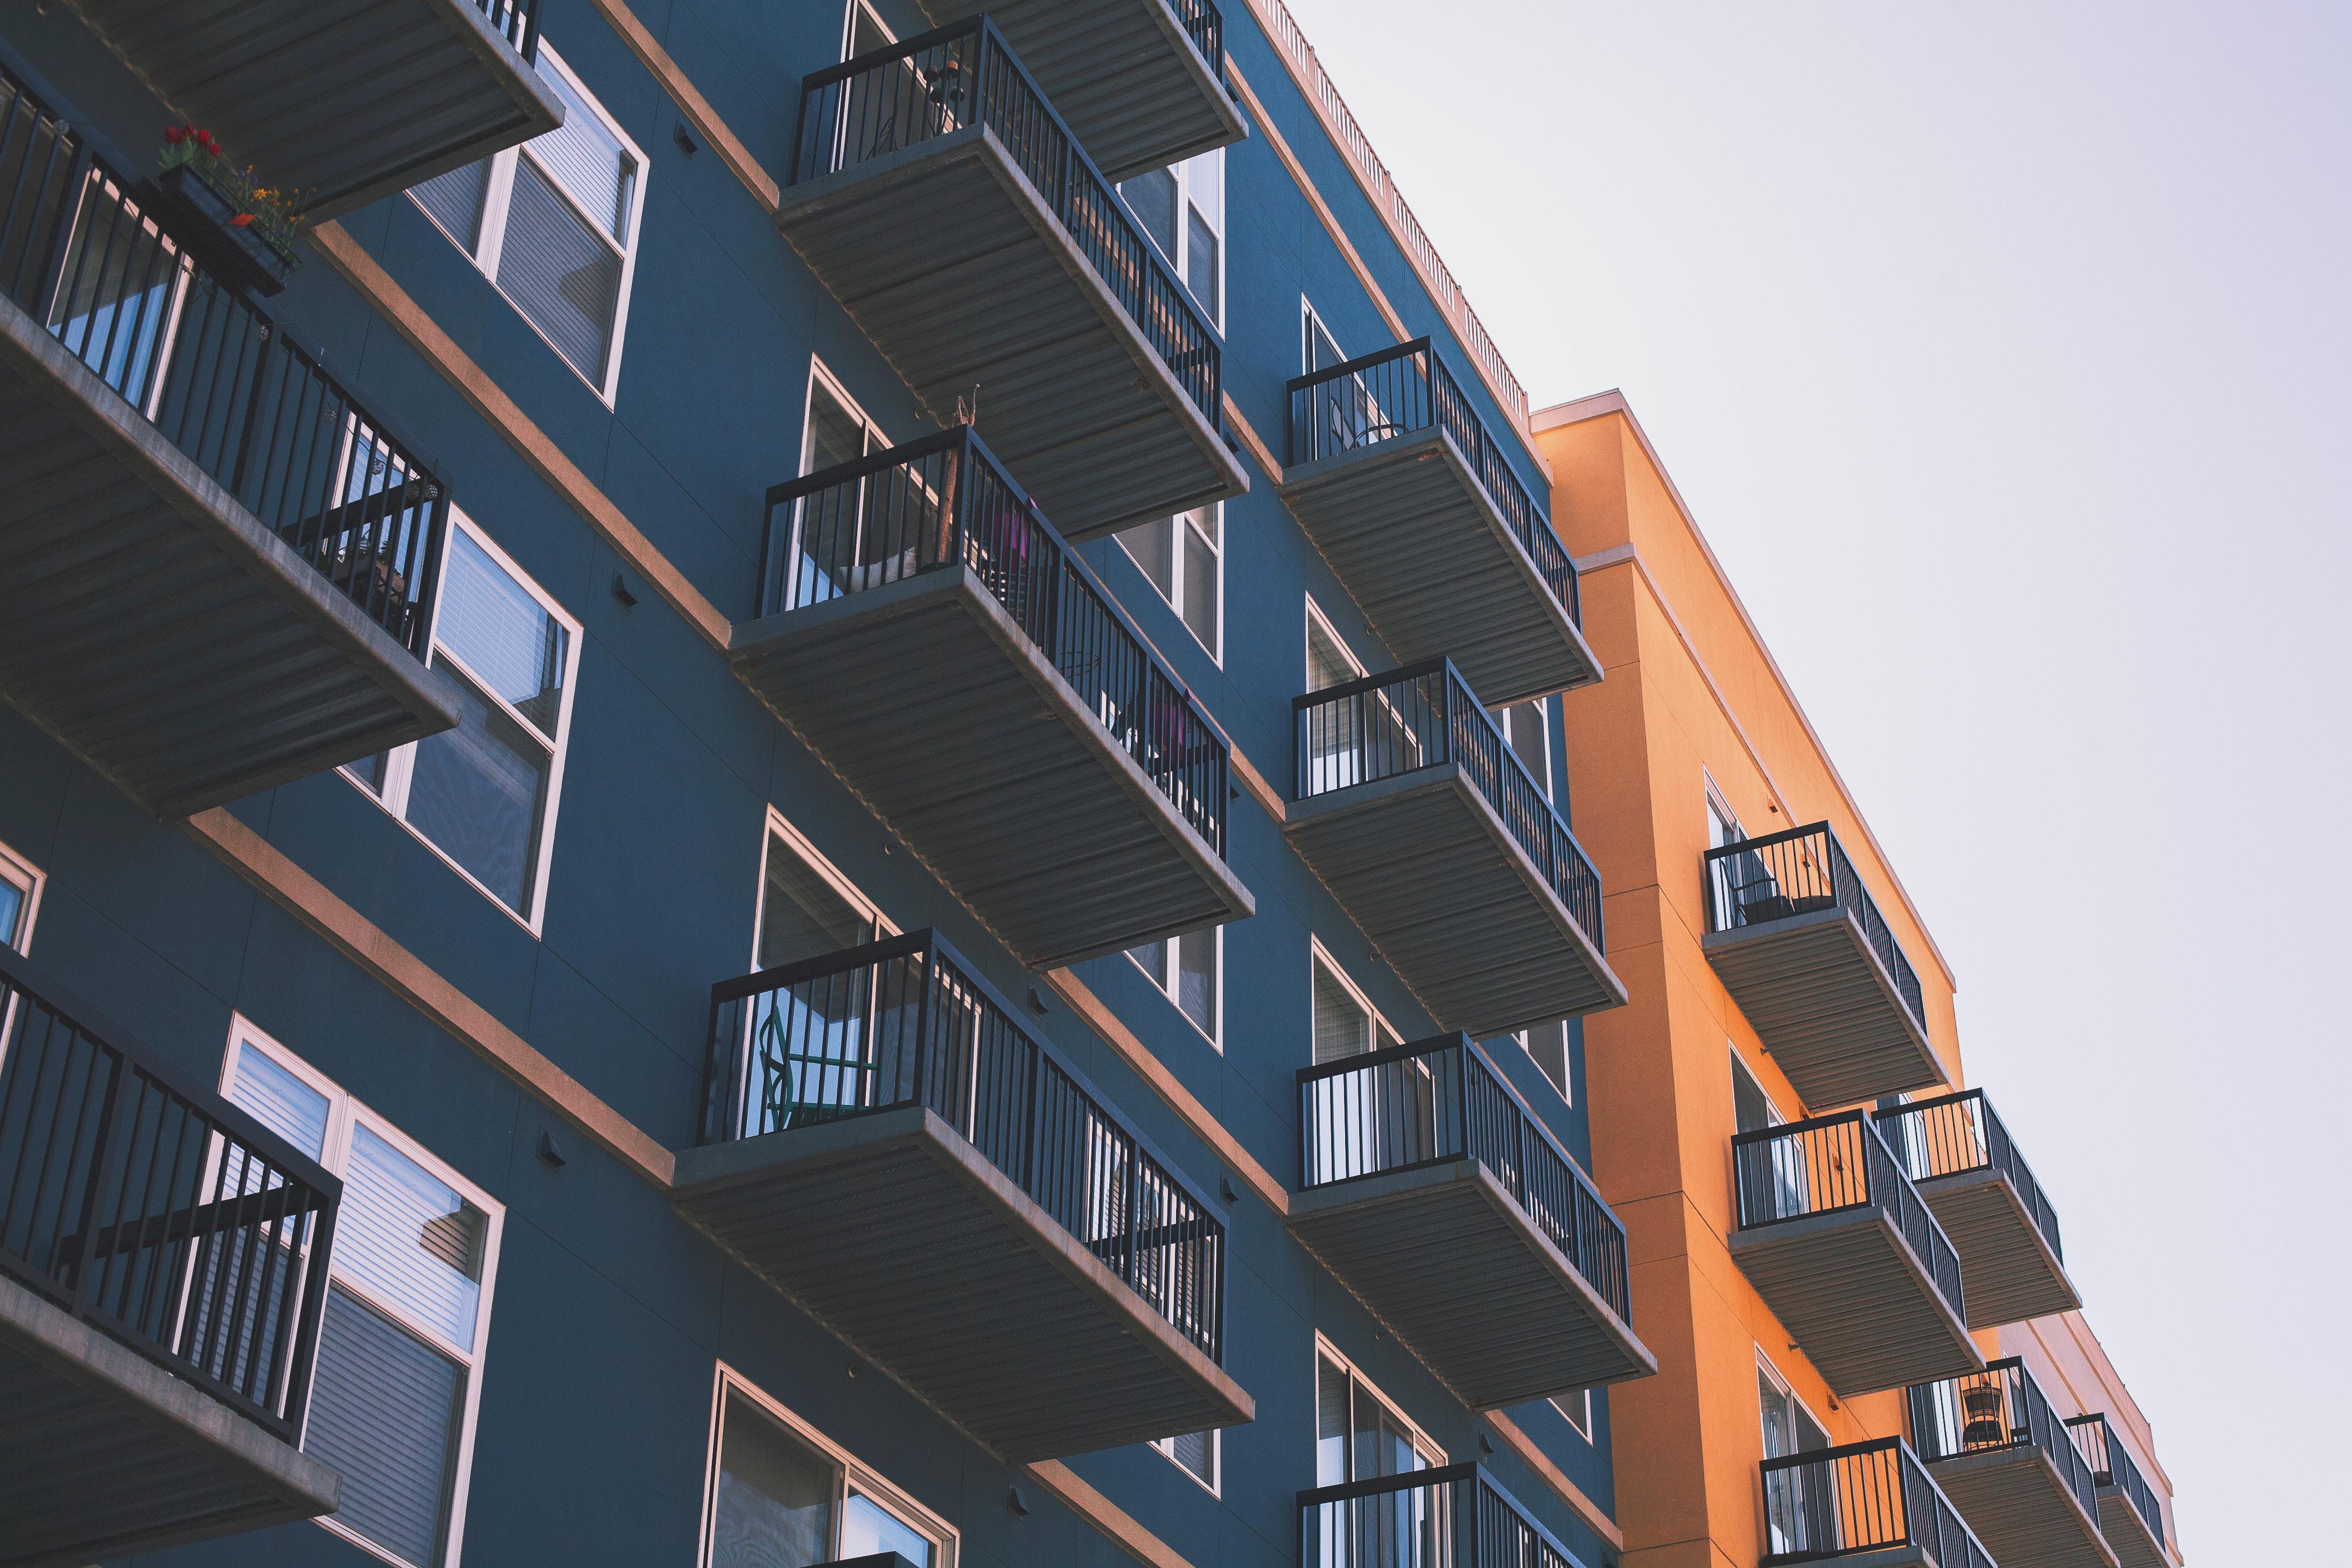 Achat Immobilier Comment Ca Marche